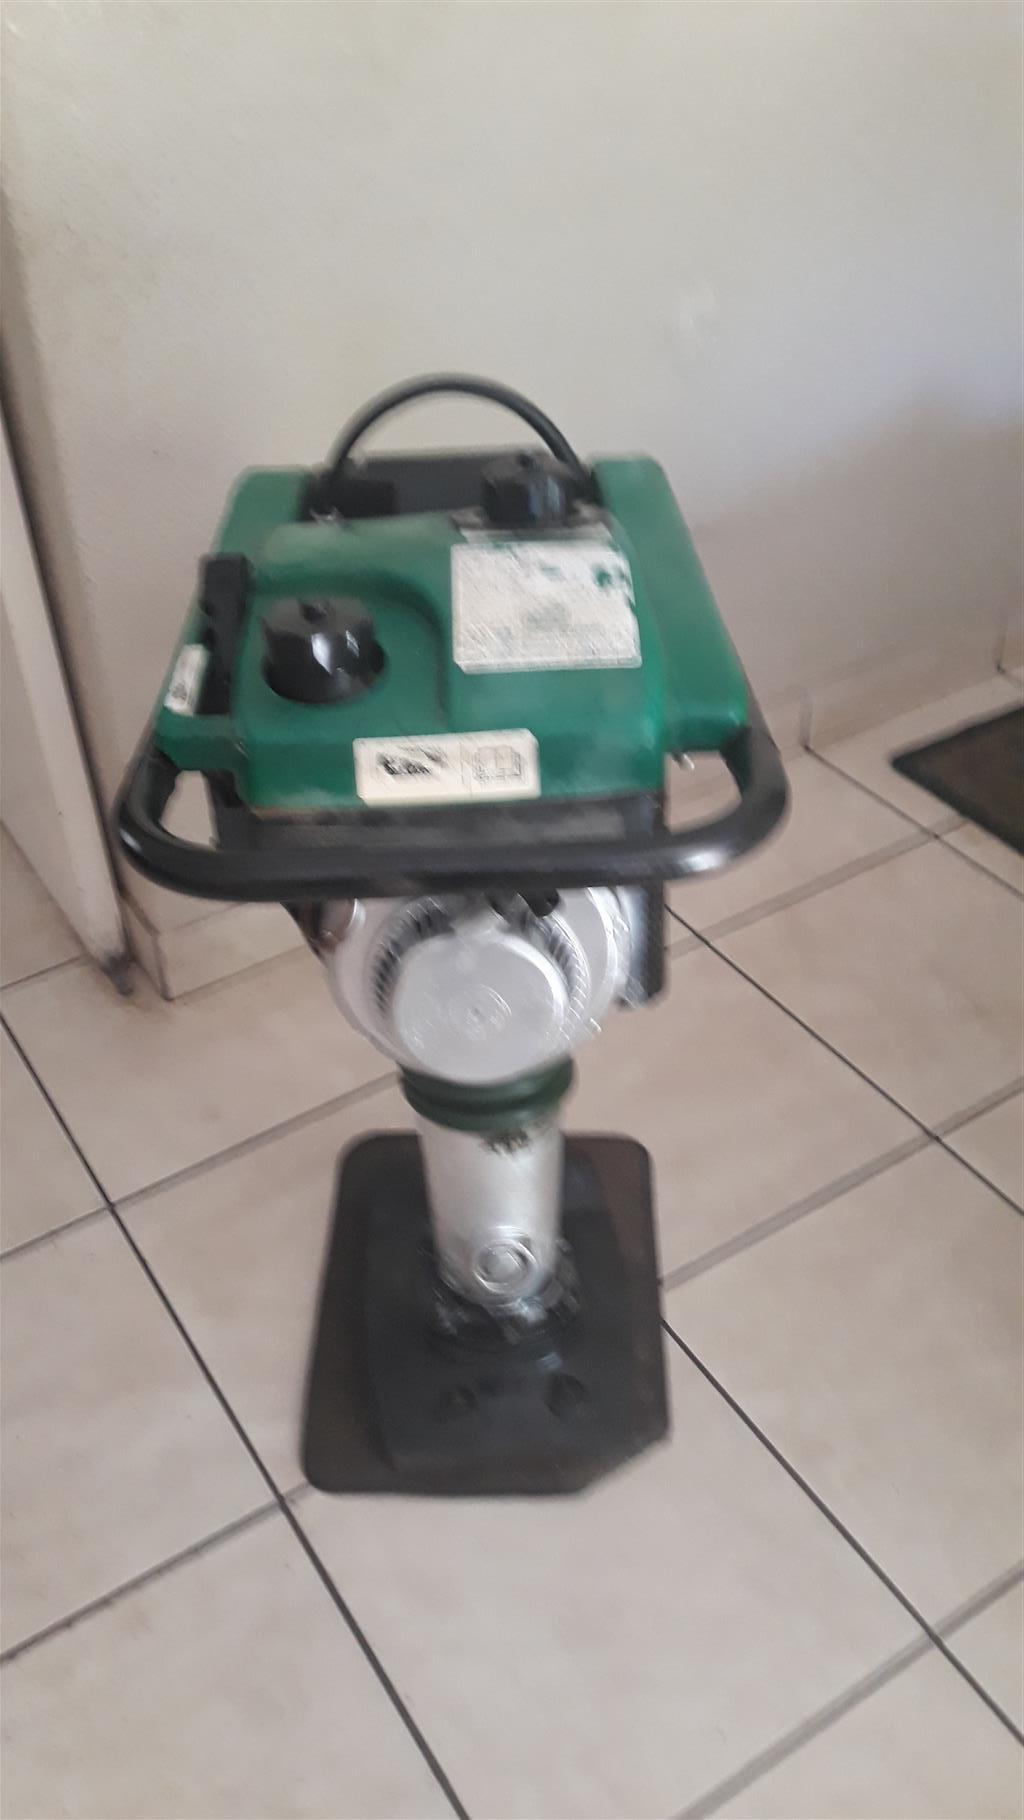 Wacker BS50 2-i Vibrating Rammer